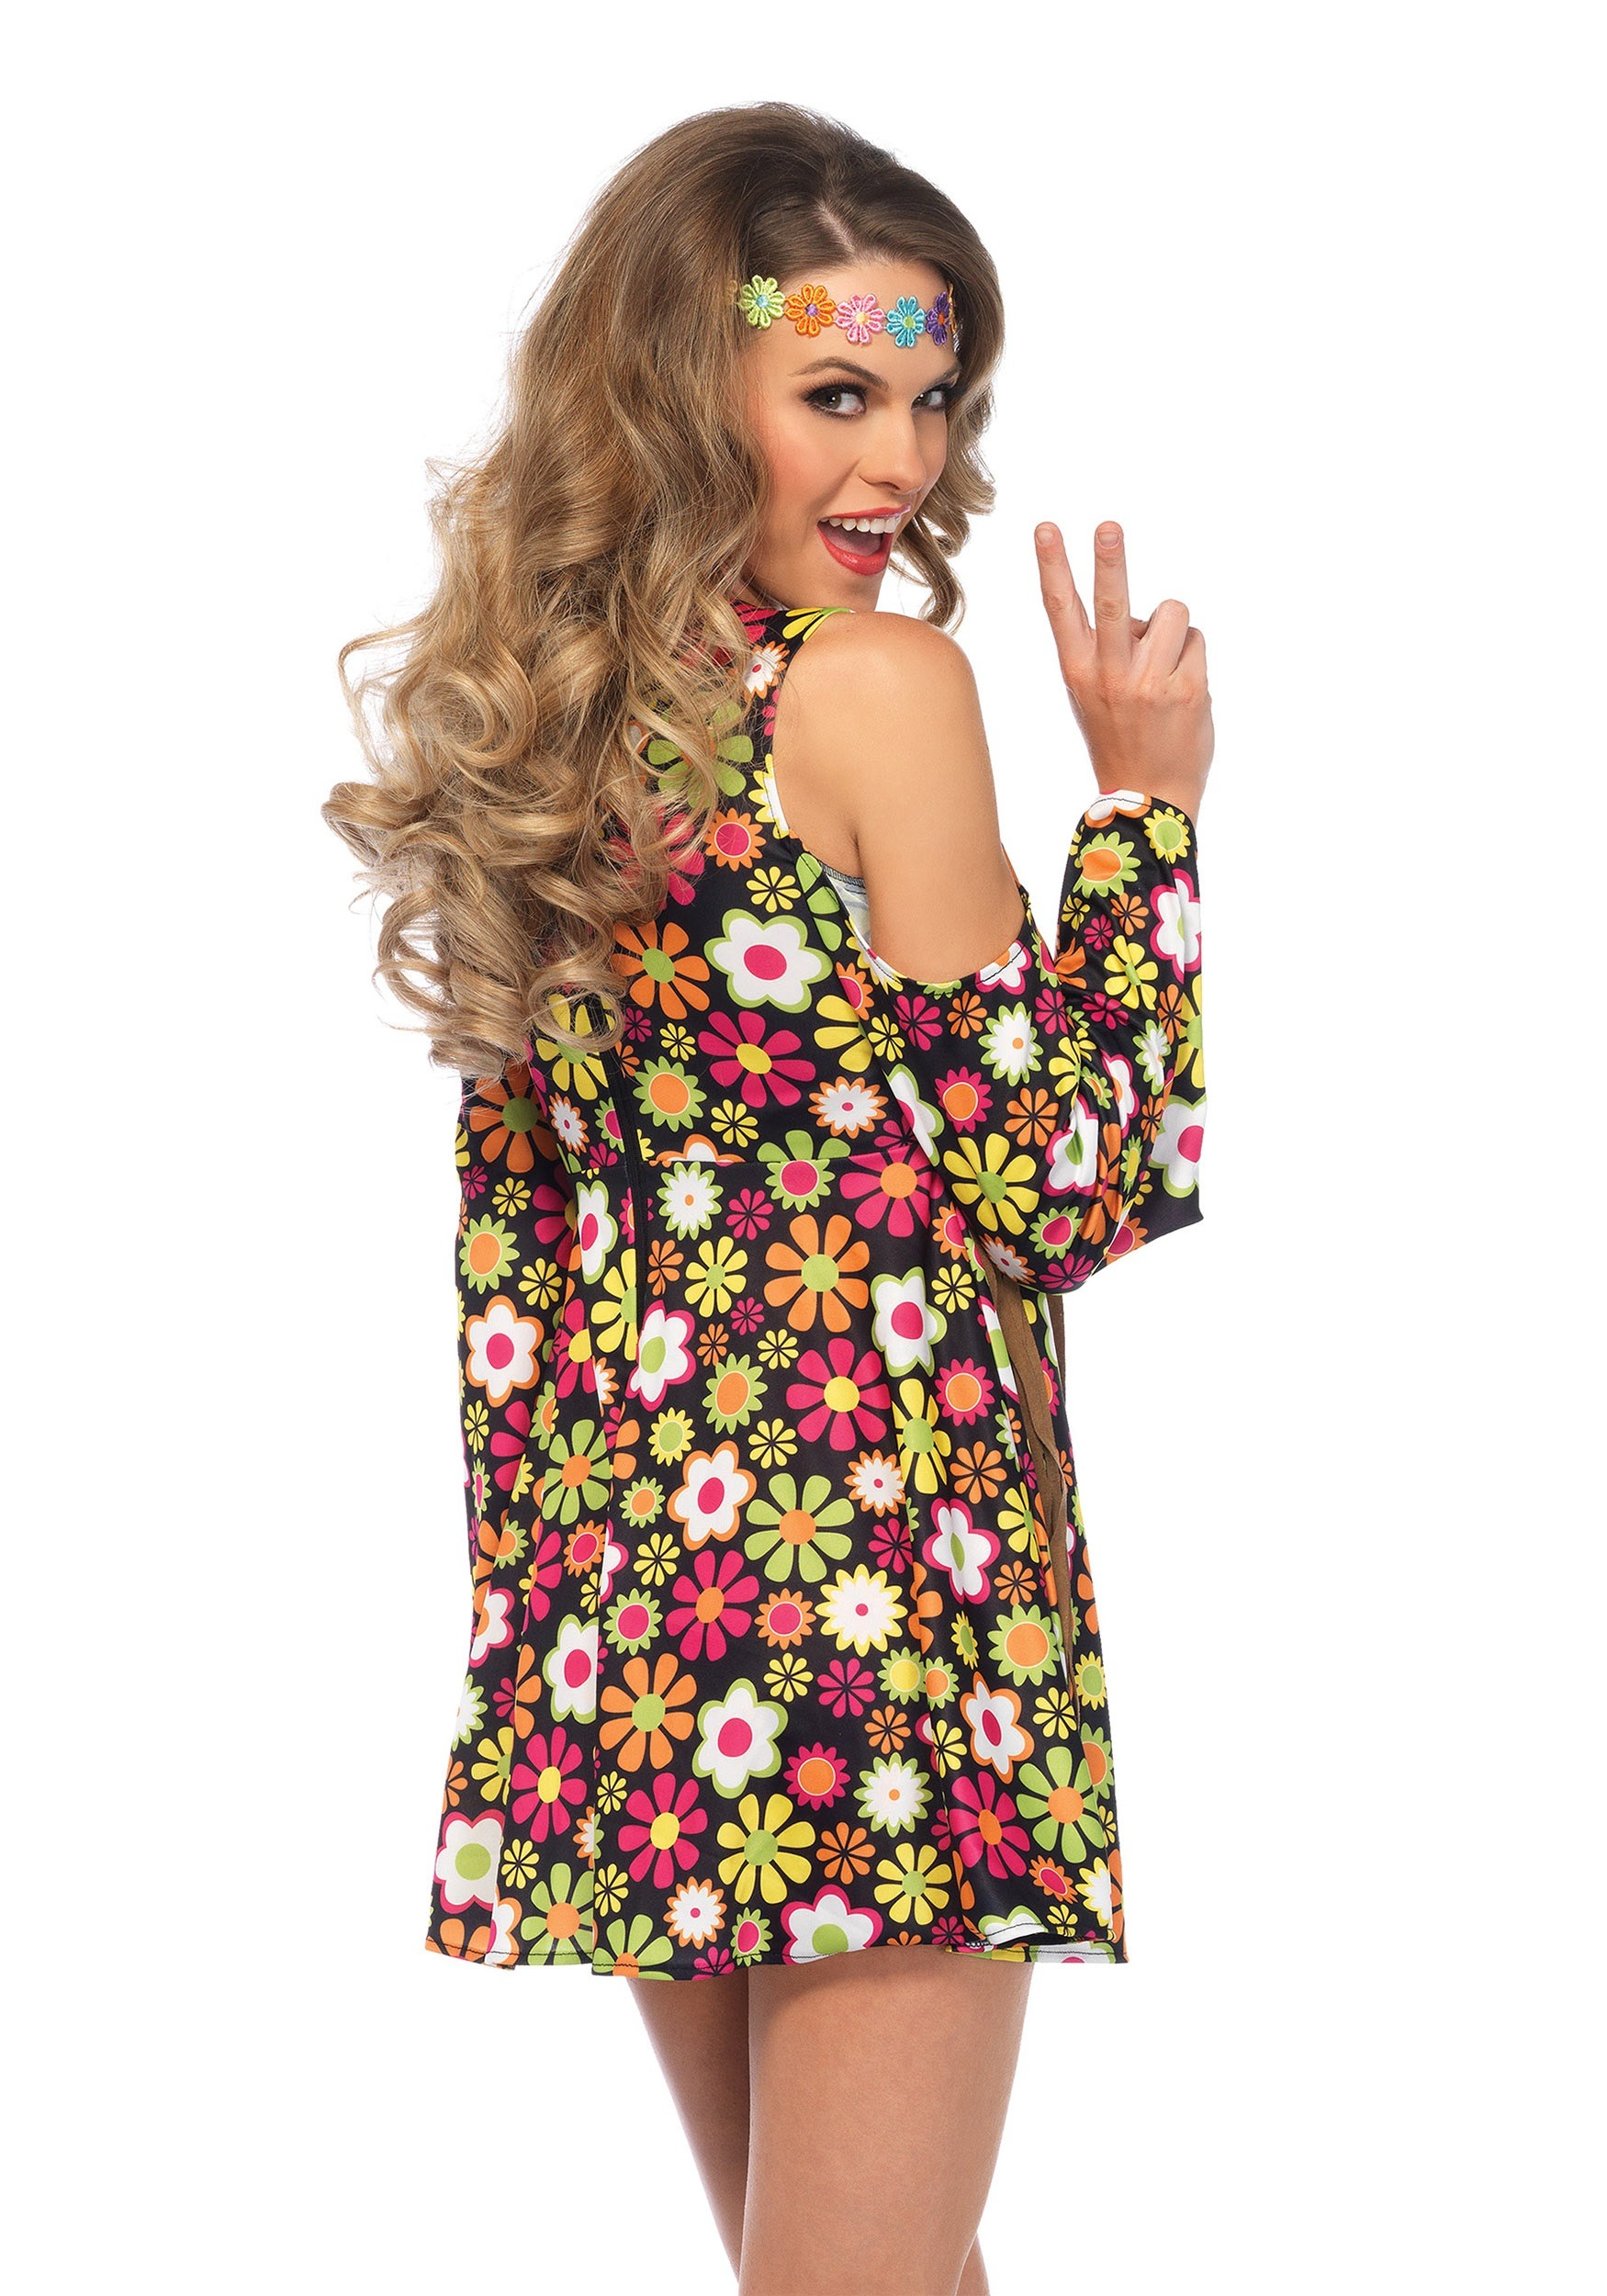 Hippie Girl Halloween Costume.Women S Starflower Hippie Costume